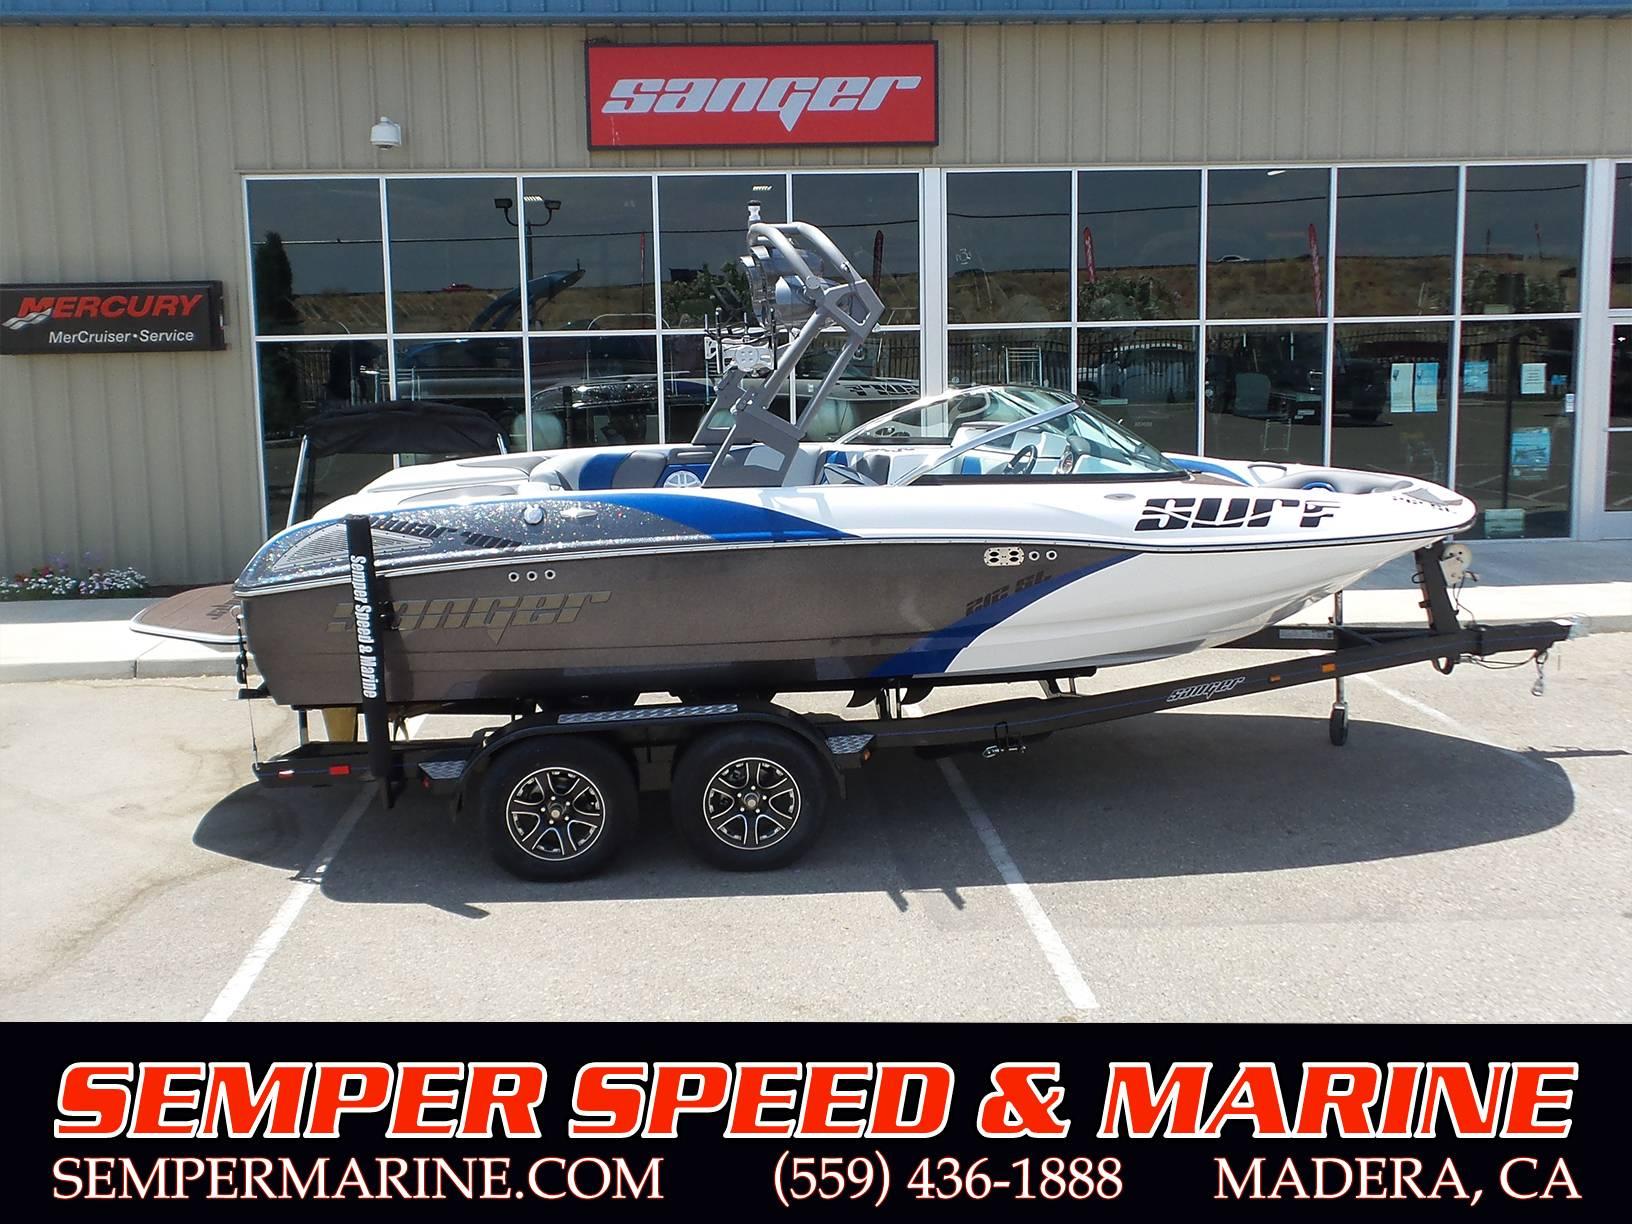 Kawasaki boats for sale - BoatTrader.com